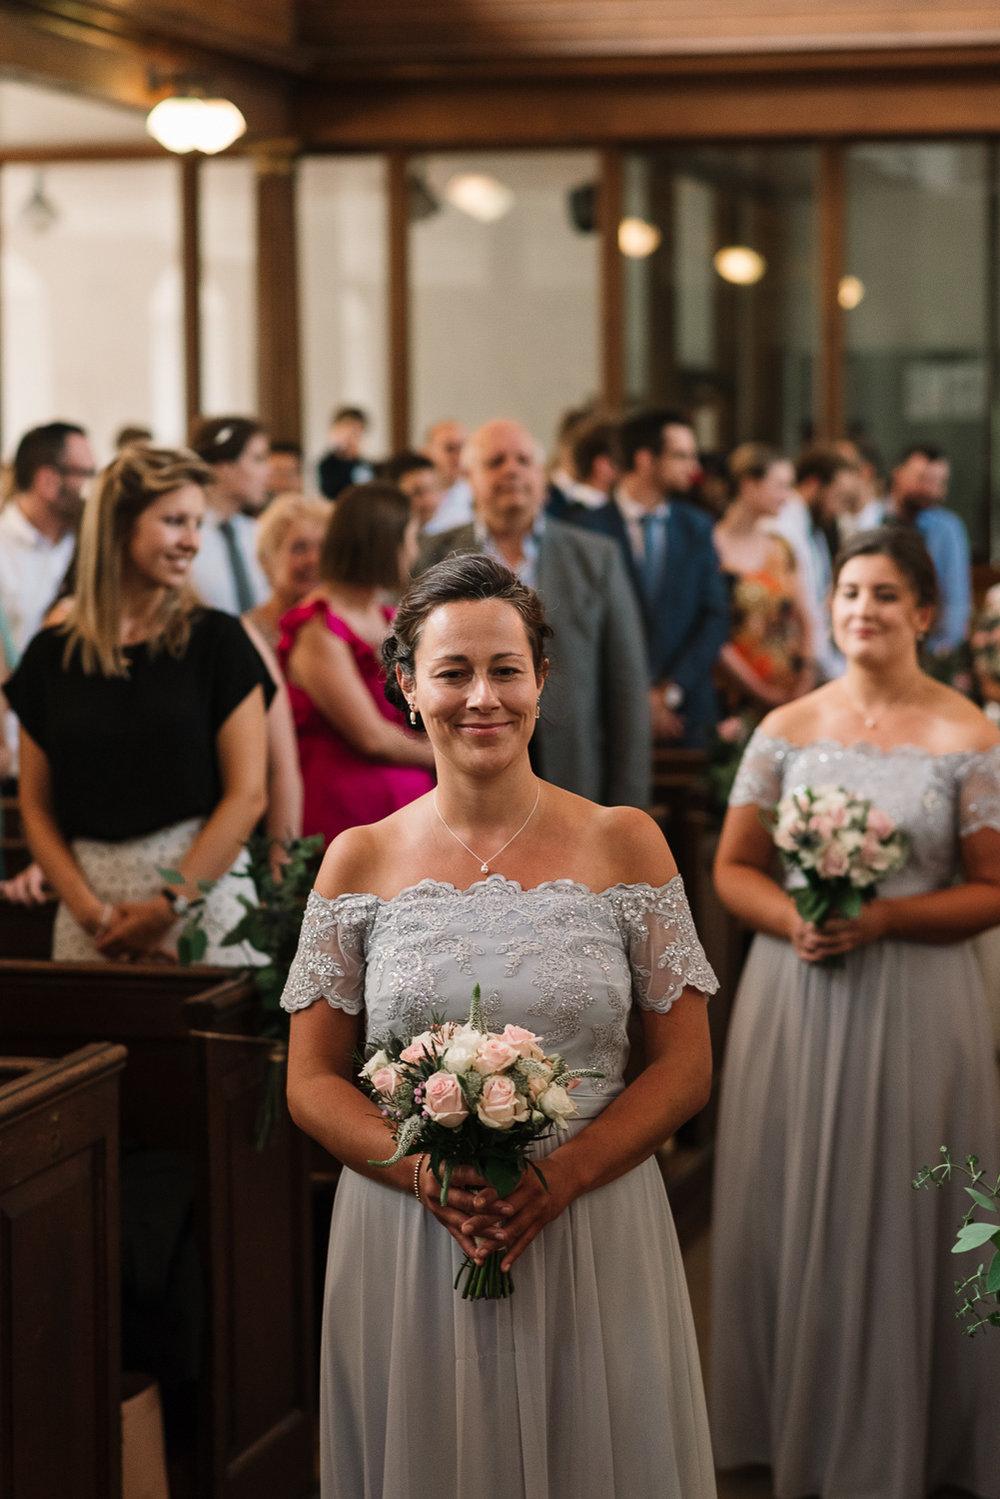 clapham-london-wedding-photographer-16.jpg